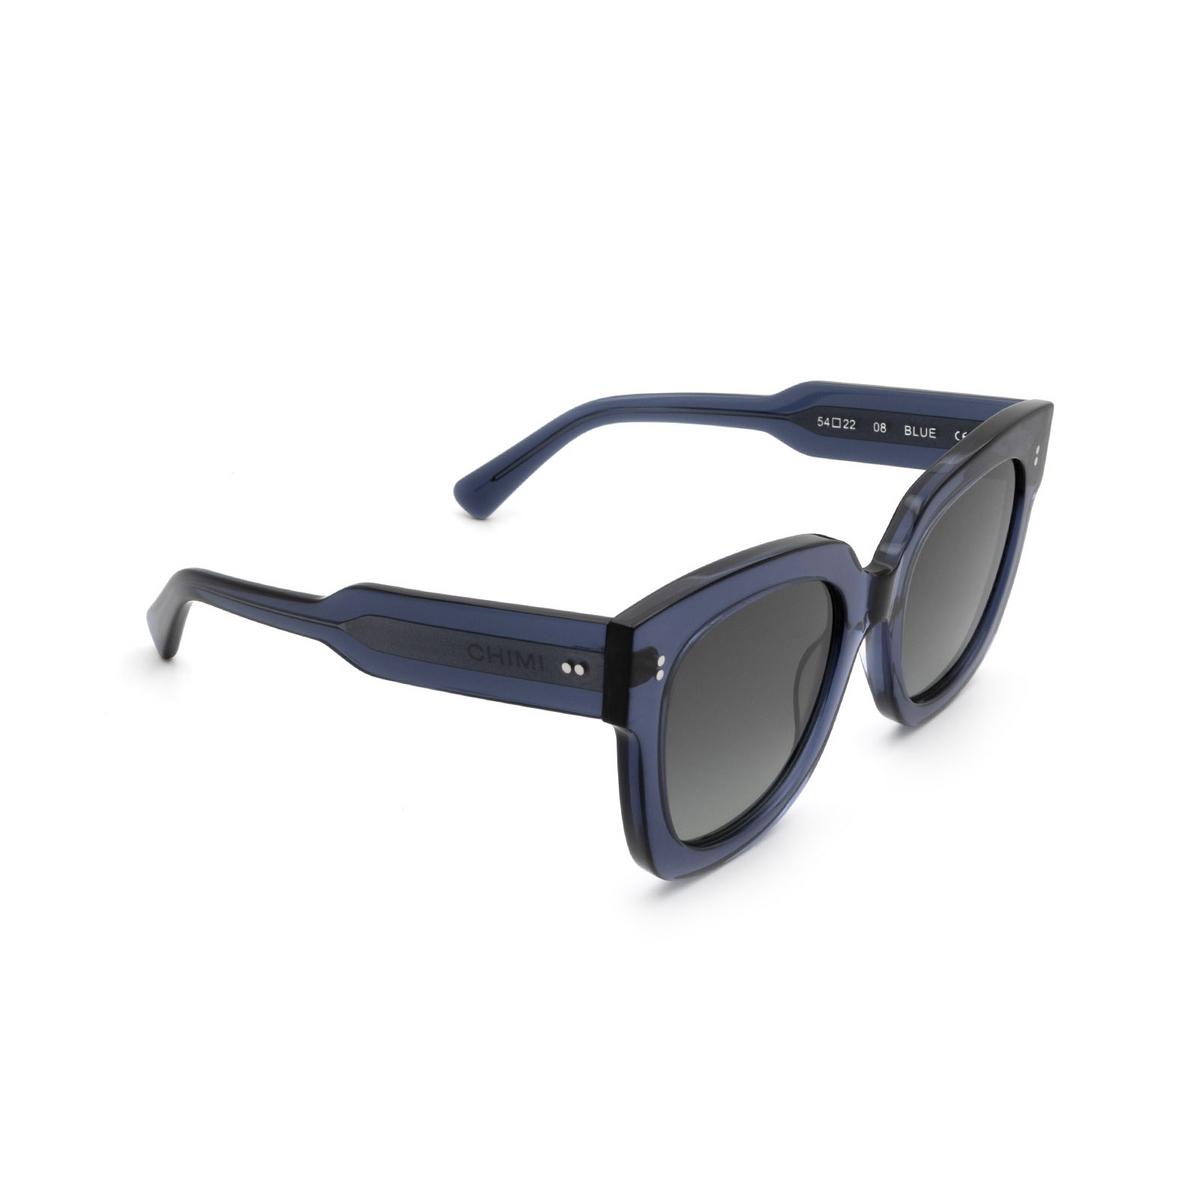 Chimi® Square Sunglasses: 08 color Blue - three-quarters view.